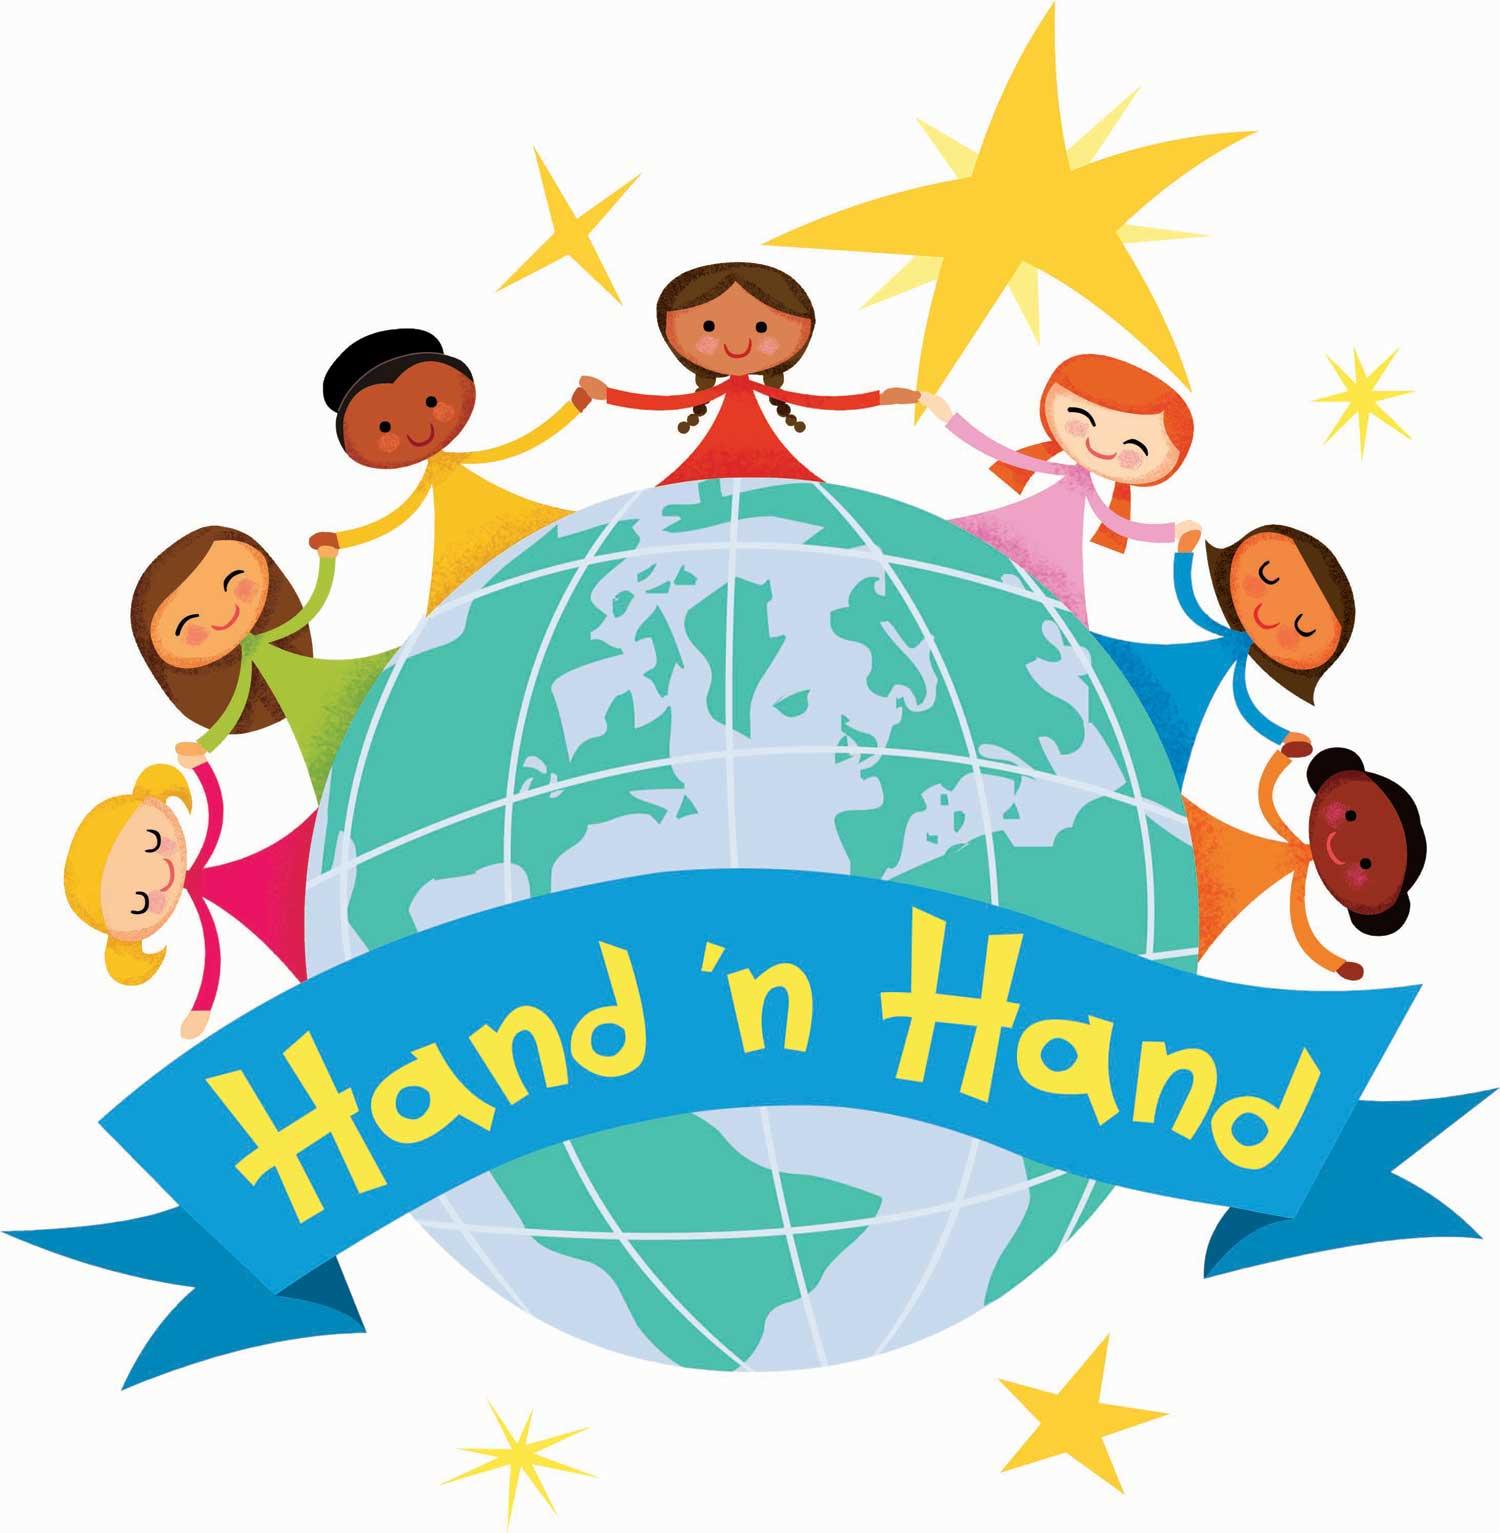 co teaching clipart free download best co teaching clipart on rh clipartmag com free clipart for sunday school teachers clipart for sunday school teachers